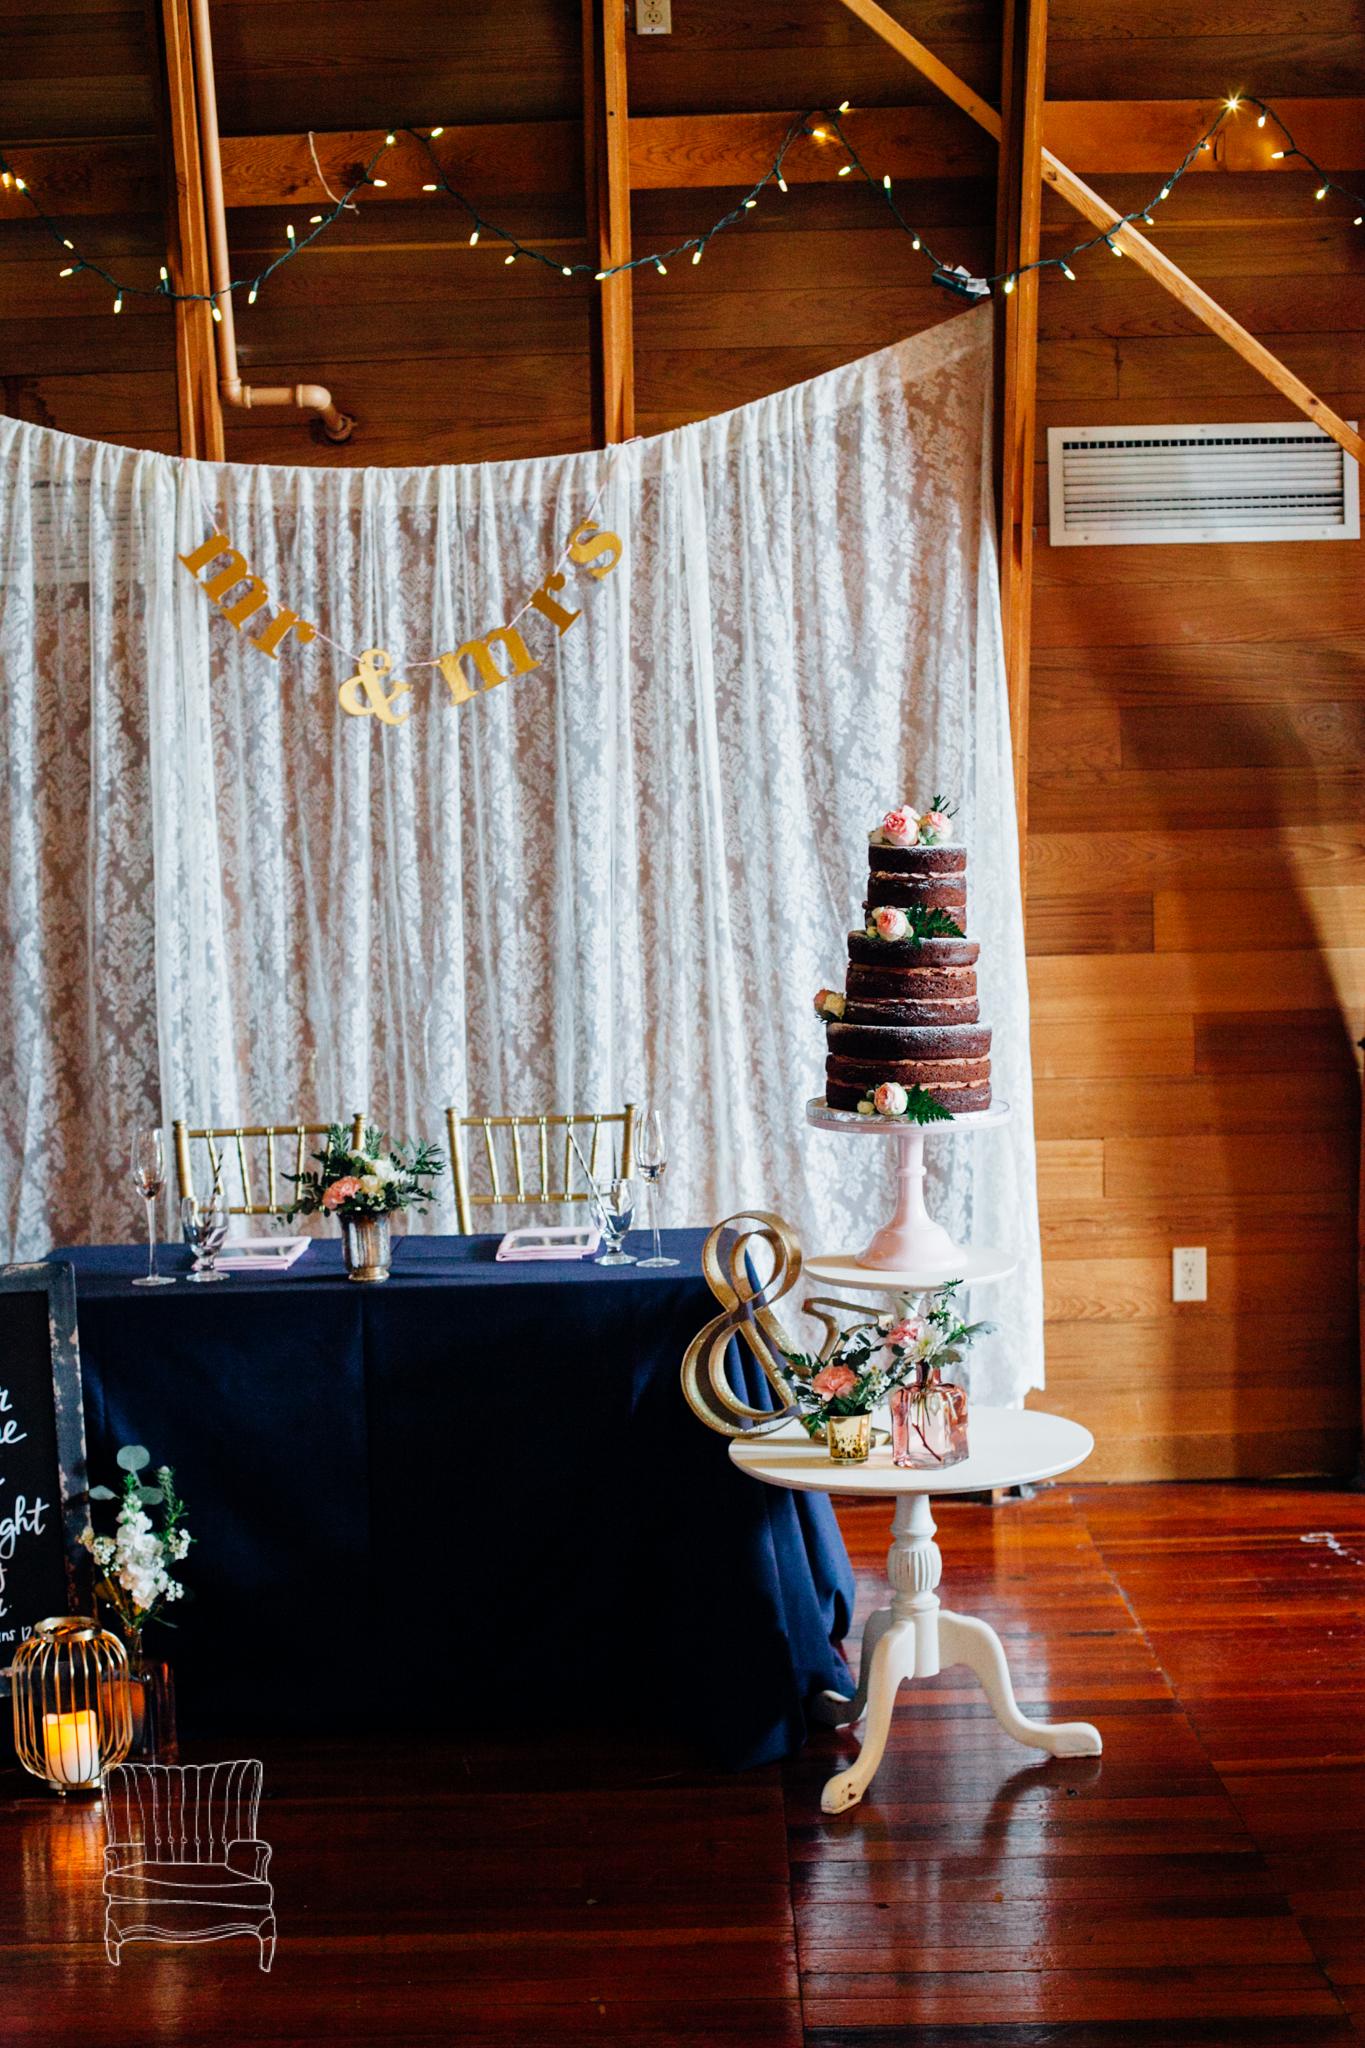 seattle-wedding-photographer-katheryn-moran-russells-bothell-wilkins-wedding-photo-37.jpg